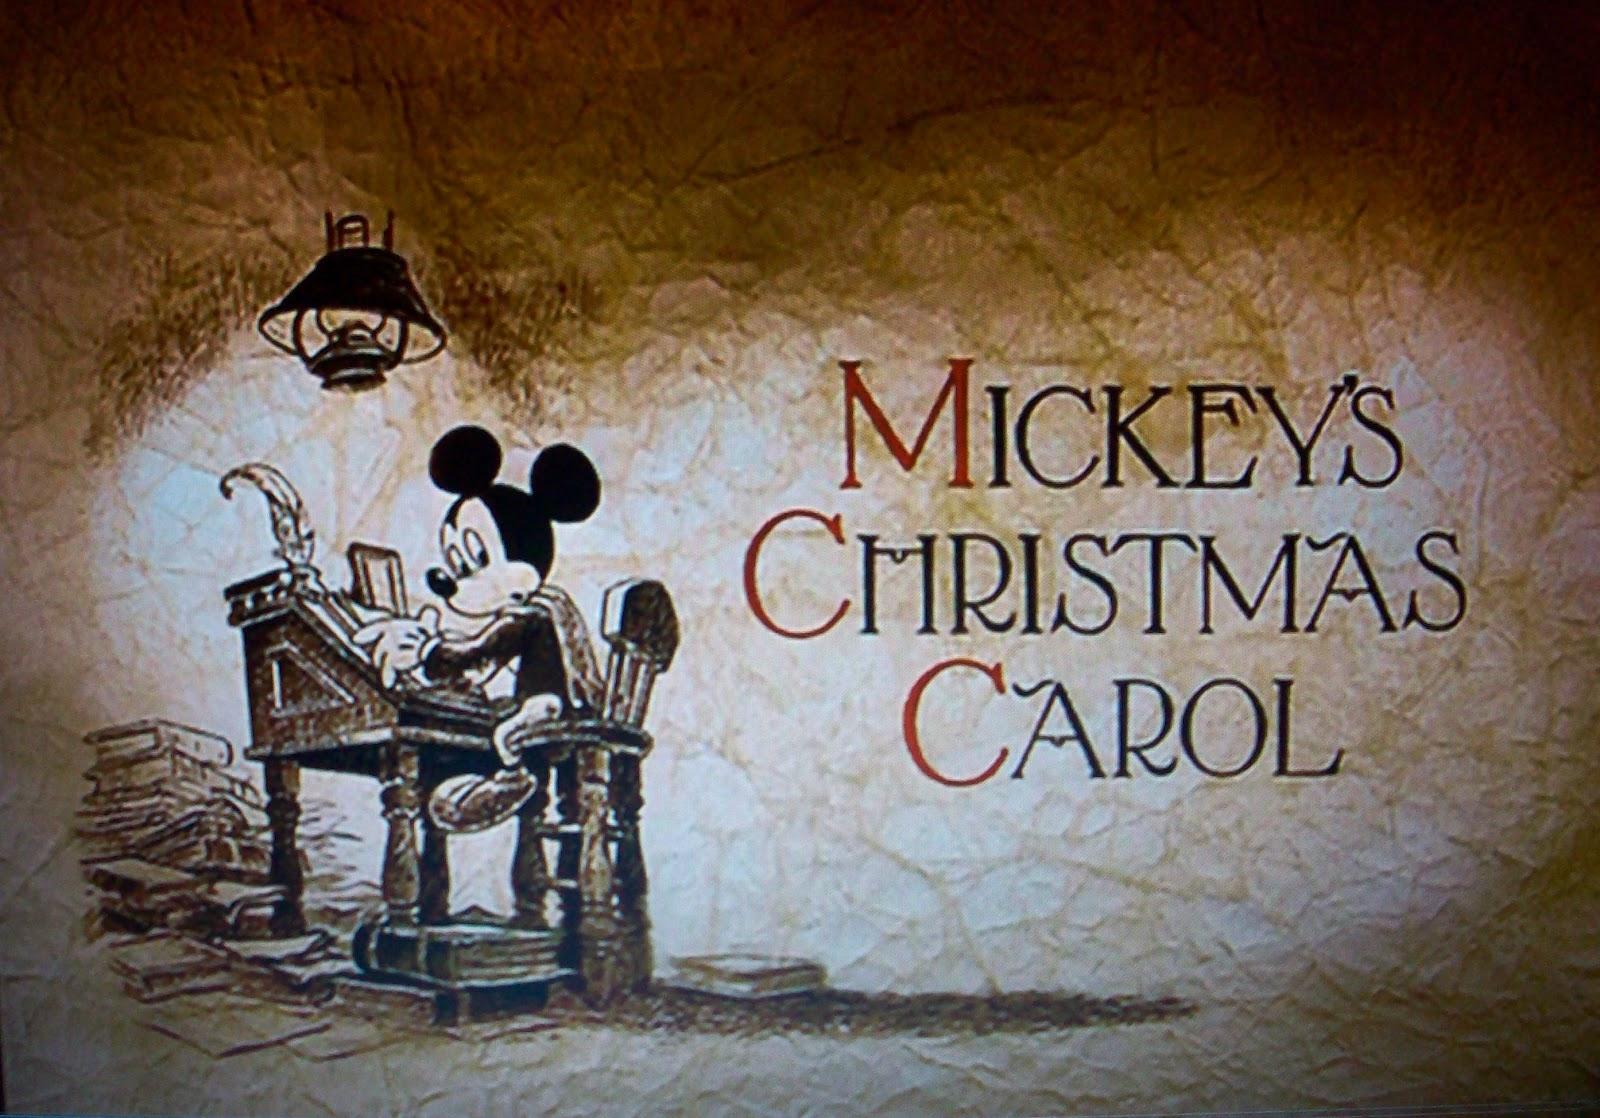 Mickeys-Christmas-Carol.jpg